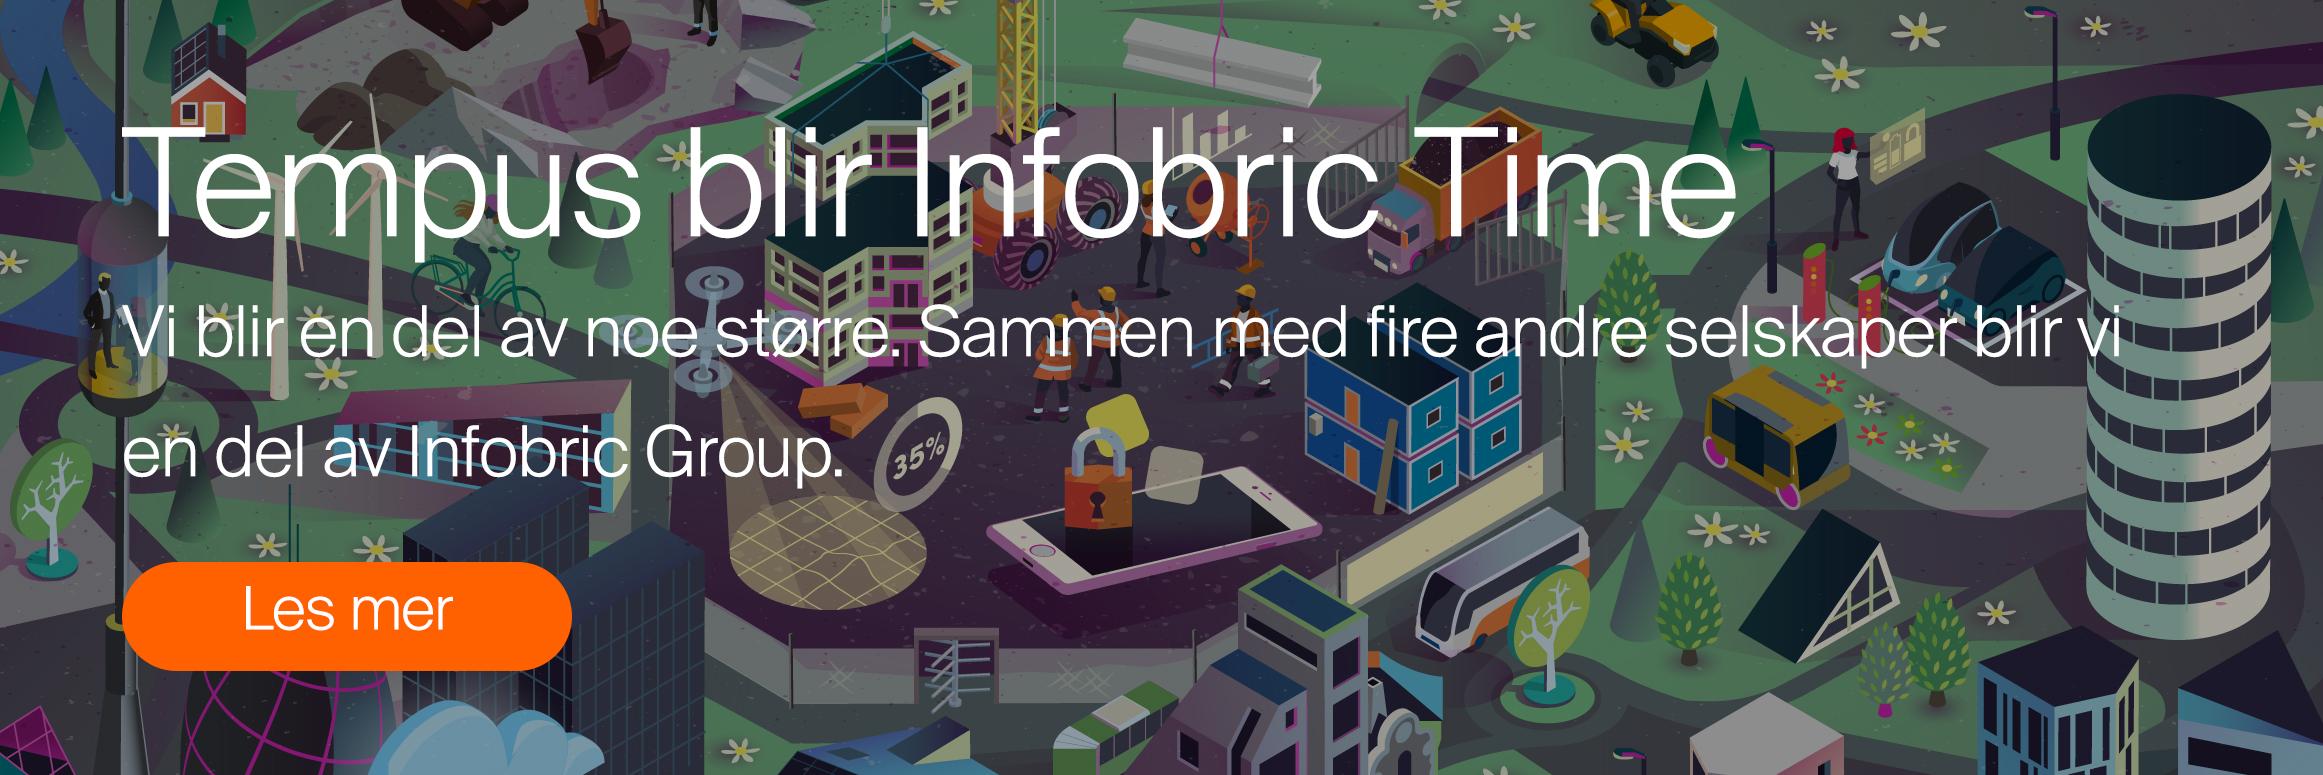 Infobric Time